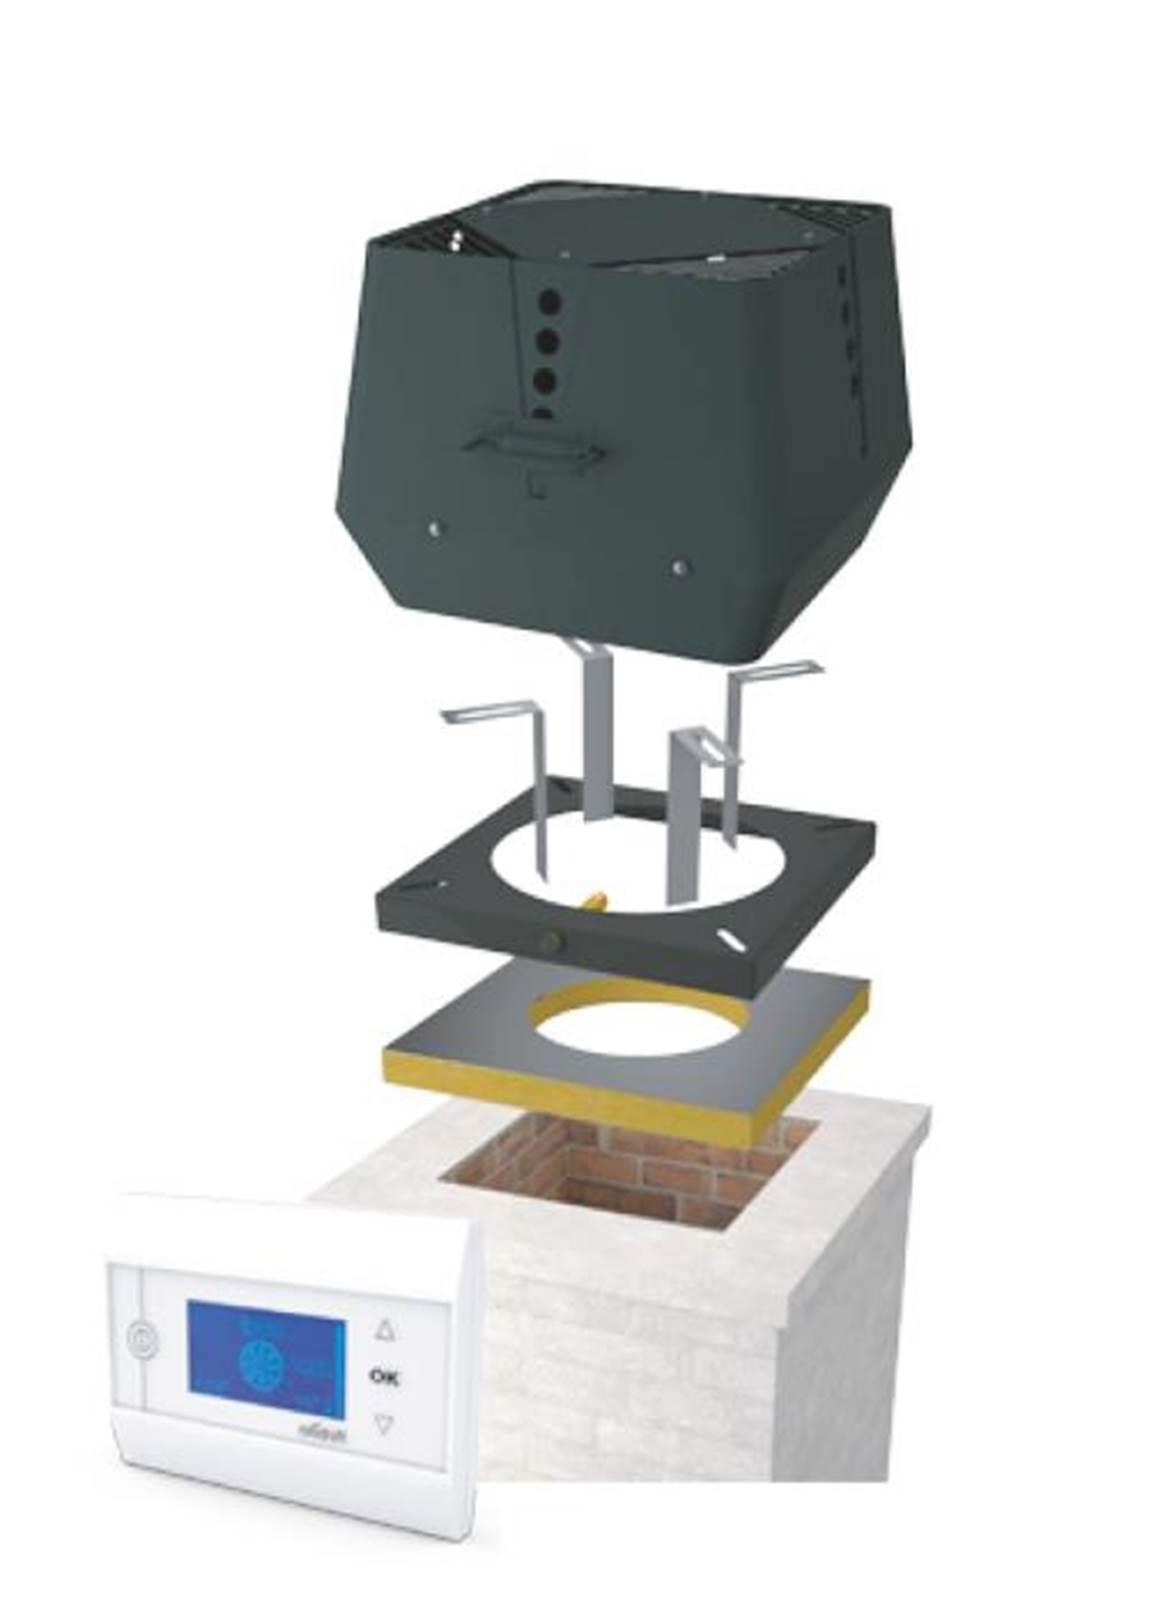 Exodraft røyksugerpakke 6 RSV-012 / EW 41